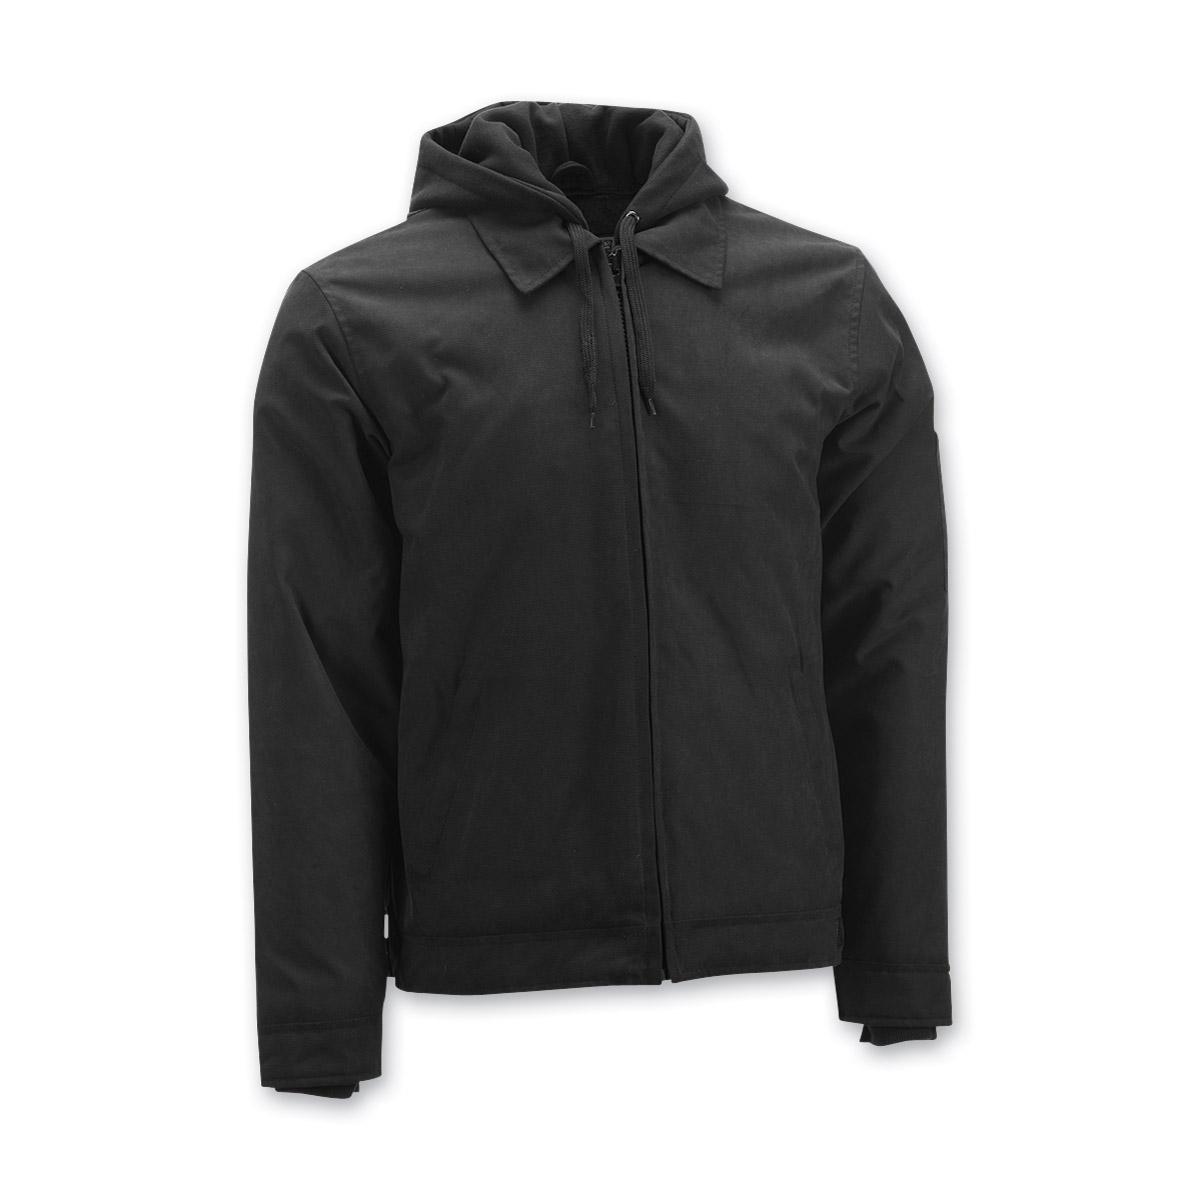 Highway 21 Gearhead Black Mechanics Jacket